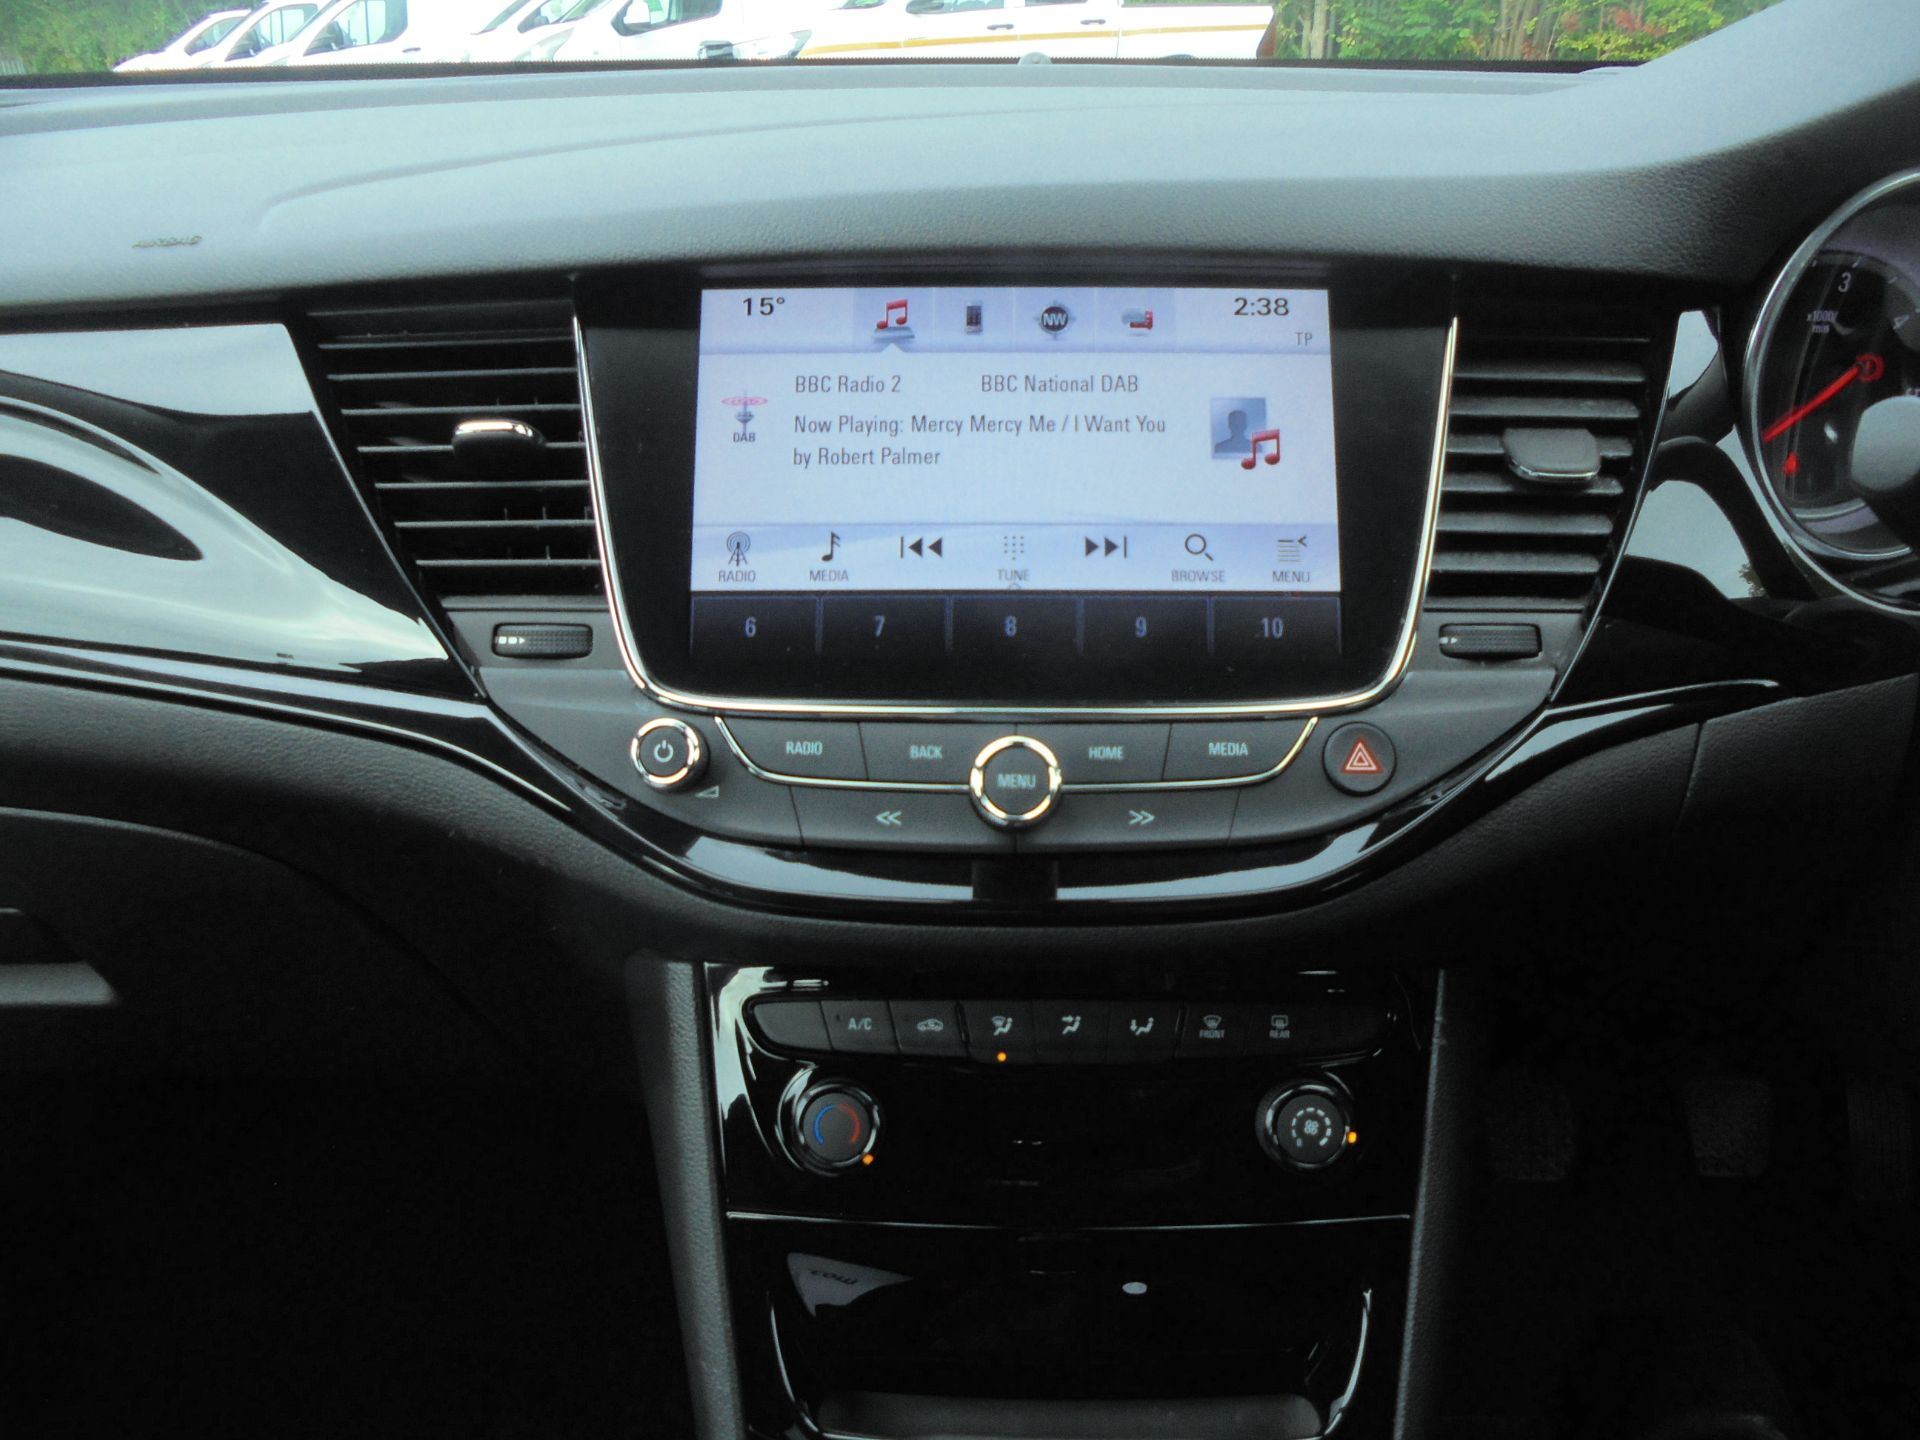 2018 Vauxhall Astra Sports Tourer 1.6 Cdti 16V 136 Sri Nav 5Dr (VU18DFJ) Image 15